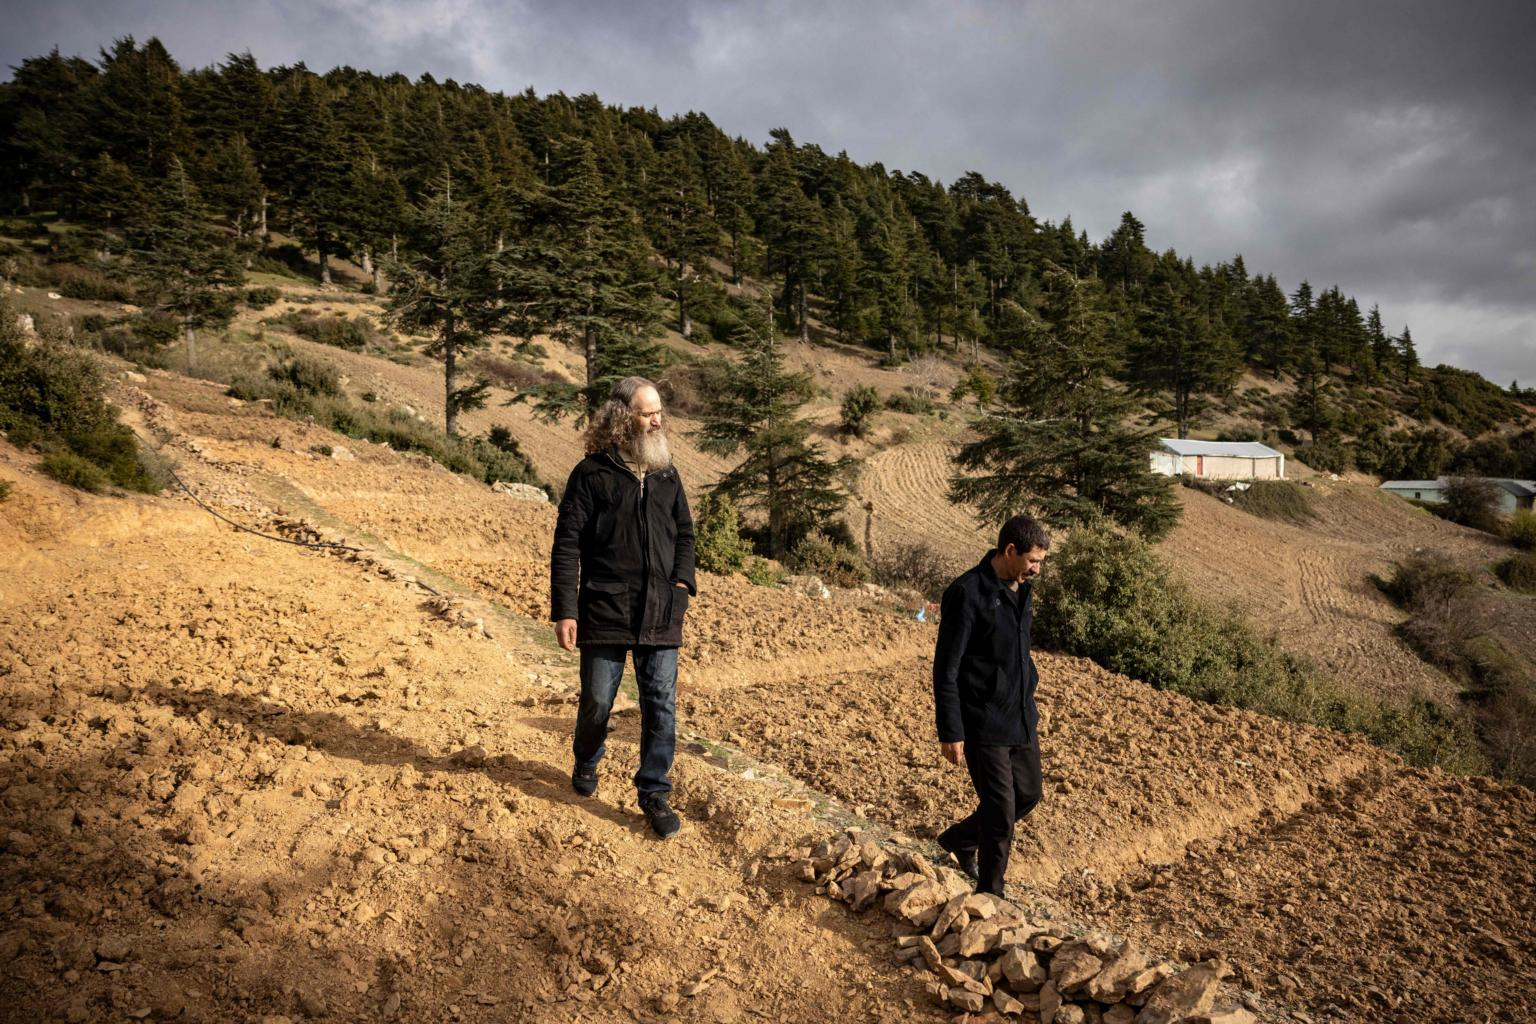 Morocco looks to fear-free hashish farms